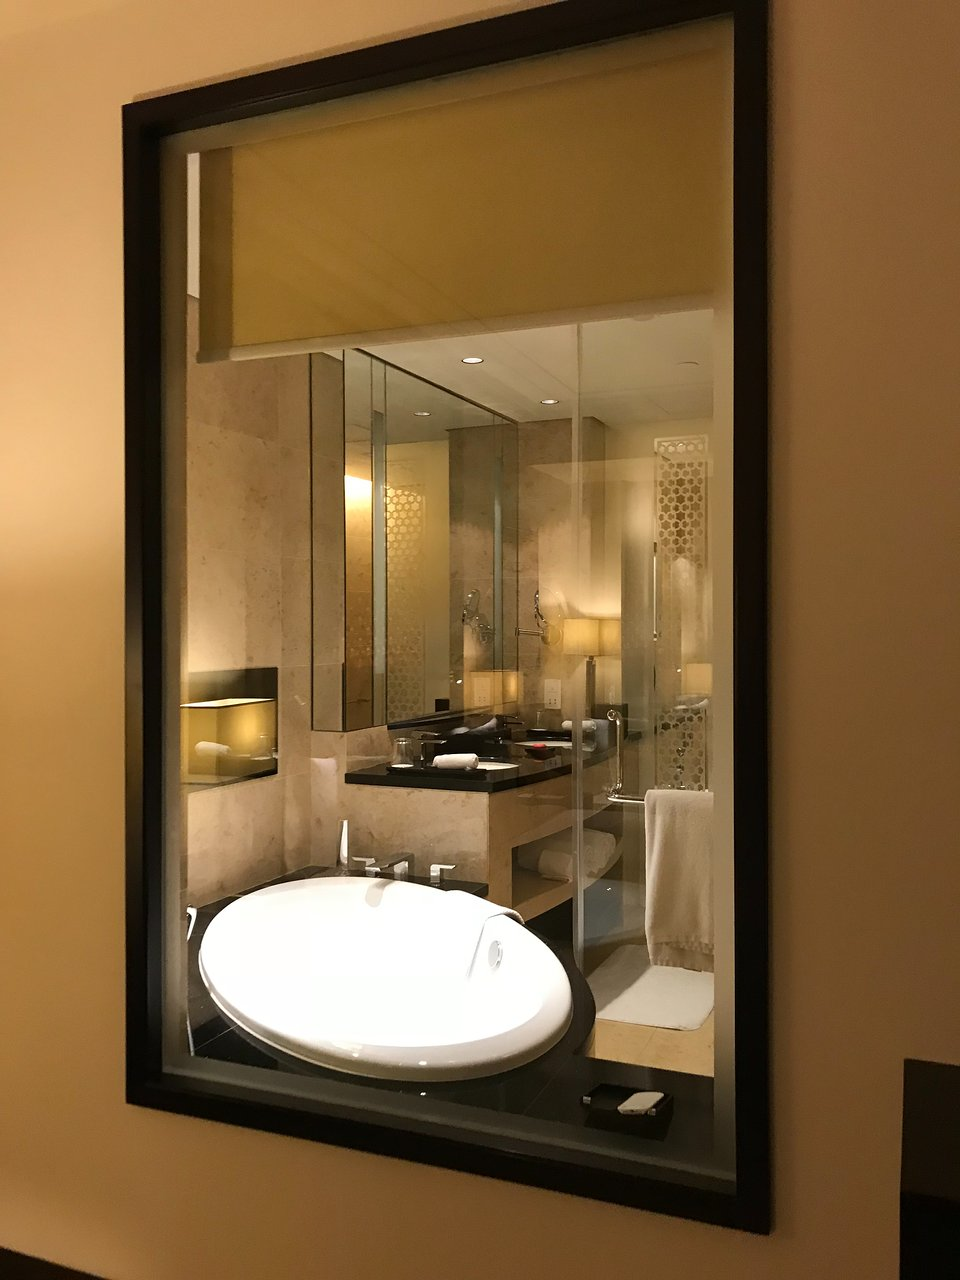 CONRAD DUBAI ab 93€ (1̶3̶5̶€̶): Bewertungen, Fotos & Preisvergleich ...